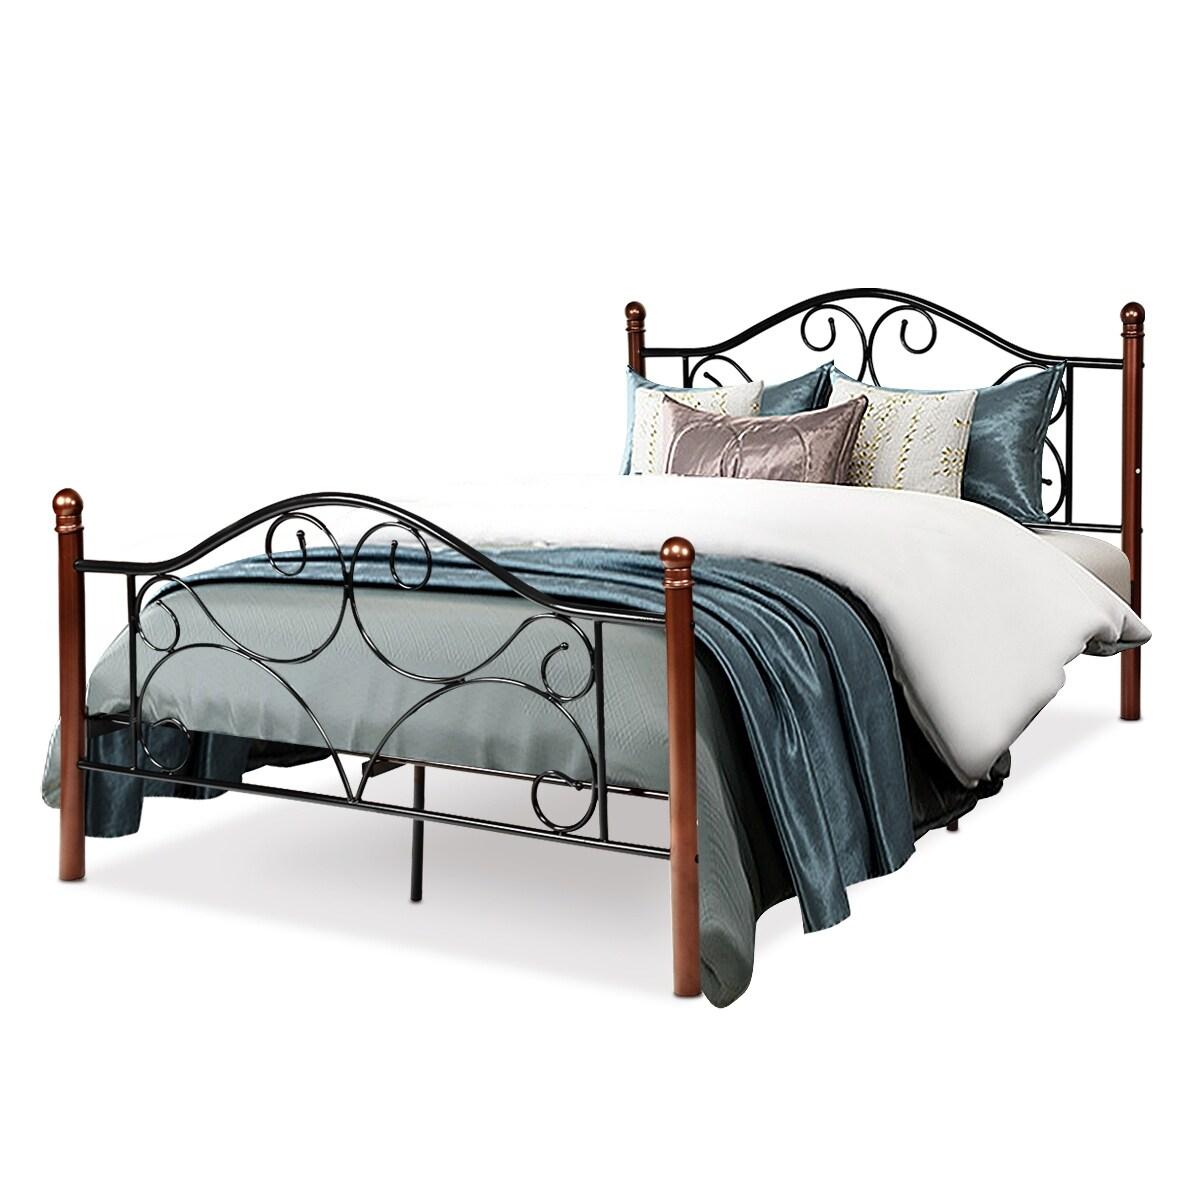 Full Size Steel Bed Frame Platform Stable Metal Slats Headboard Footboard New Home Garden Home Garden Furniture